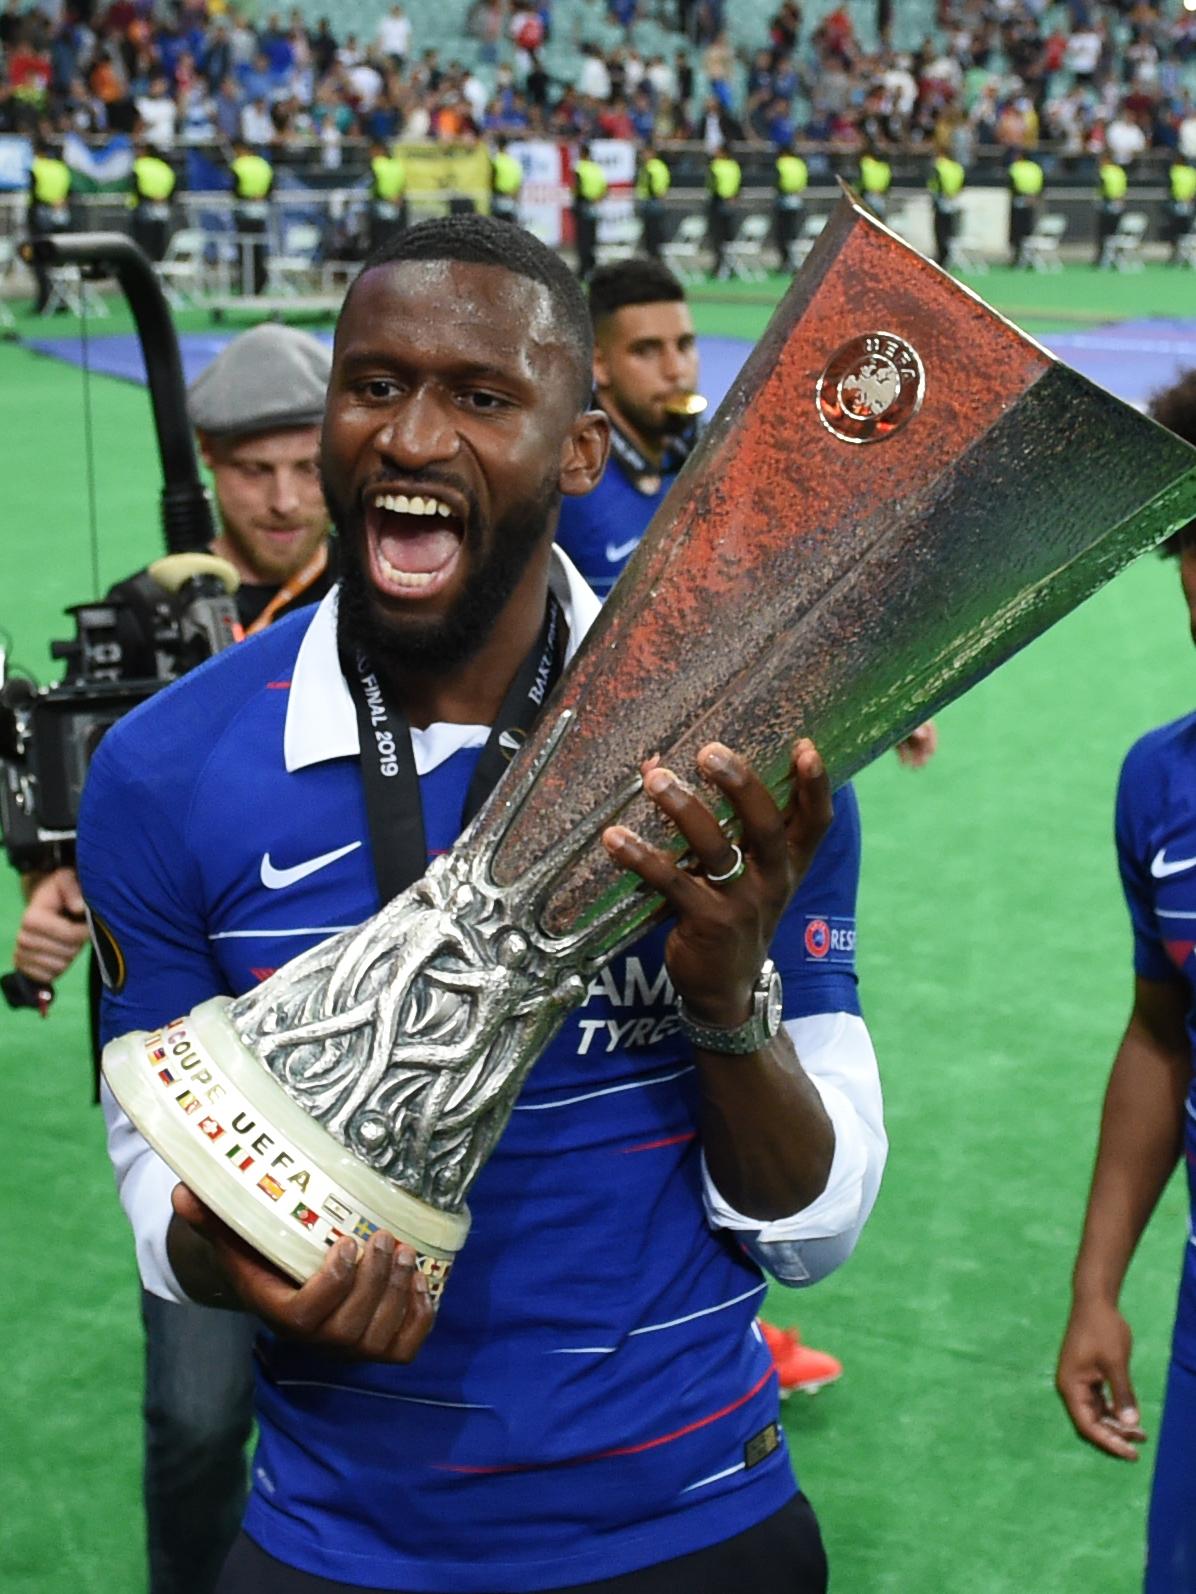 Chelsea targeting mid-September return for Antonio Rüdiger — report